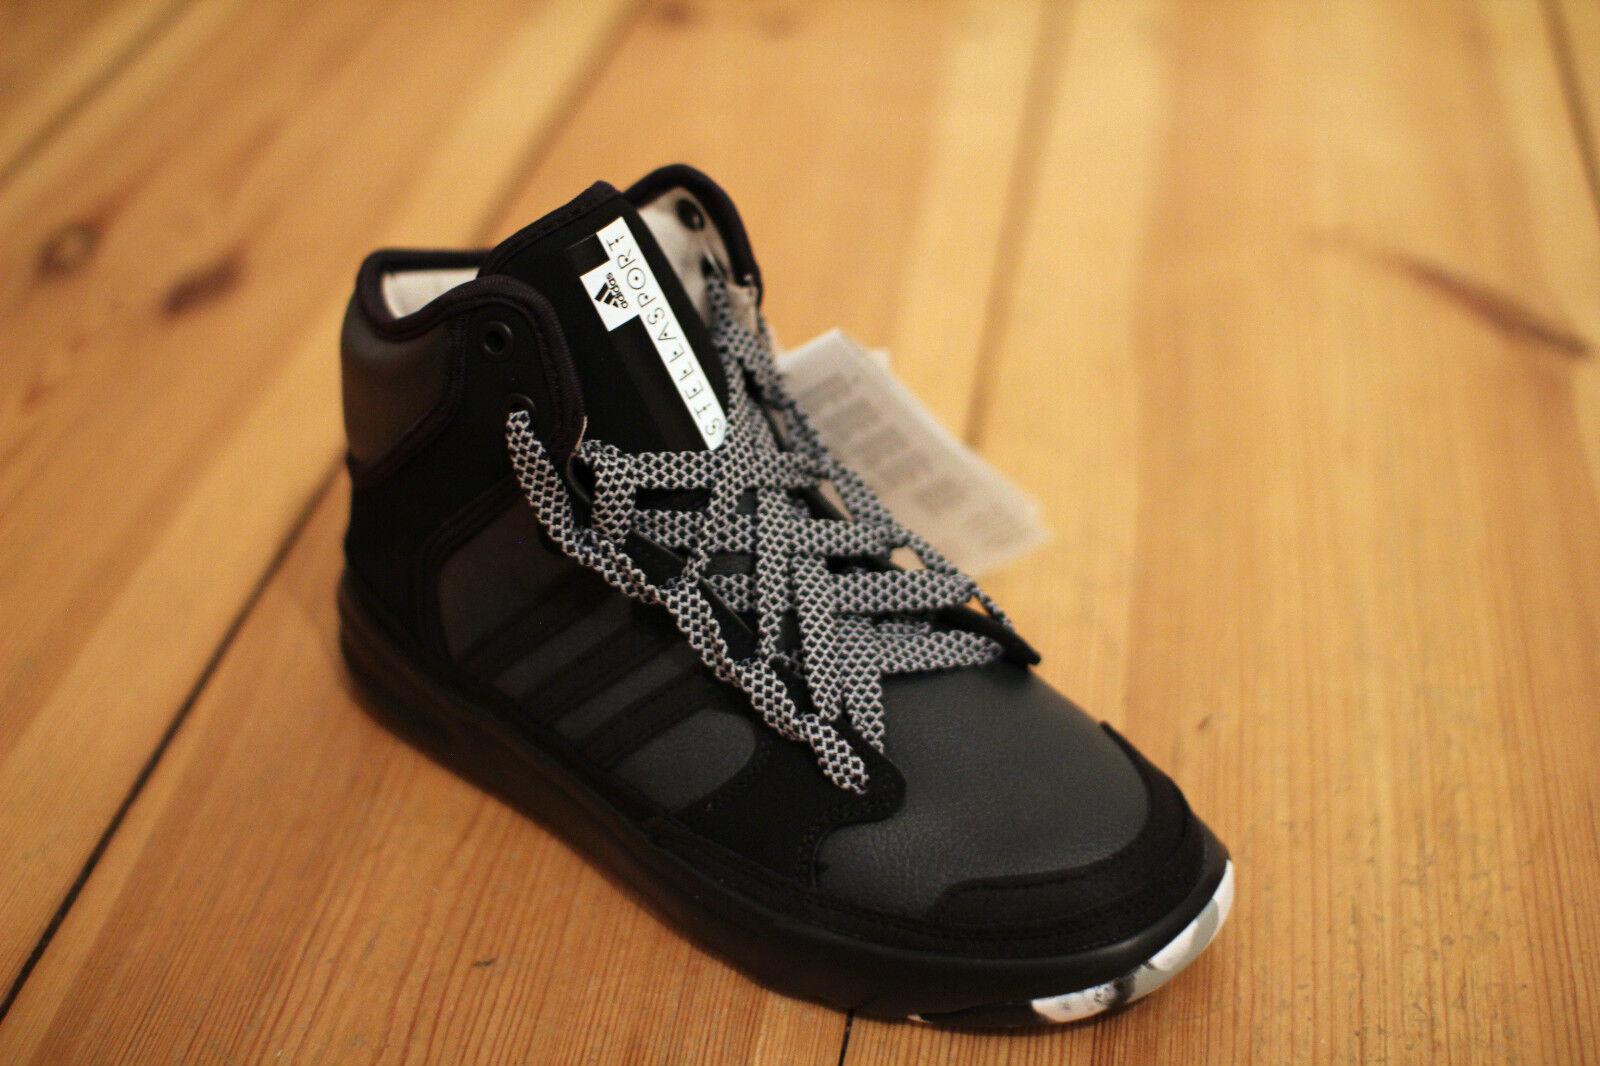 Adidas Stella MC Cartney Irana OVP schwarz Gr.36,37,38,40,41 NEU & OVP Irana c2f357